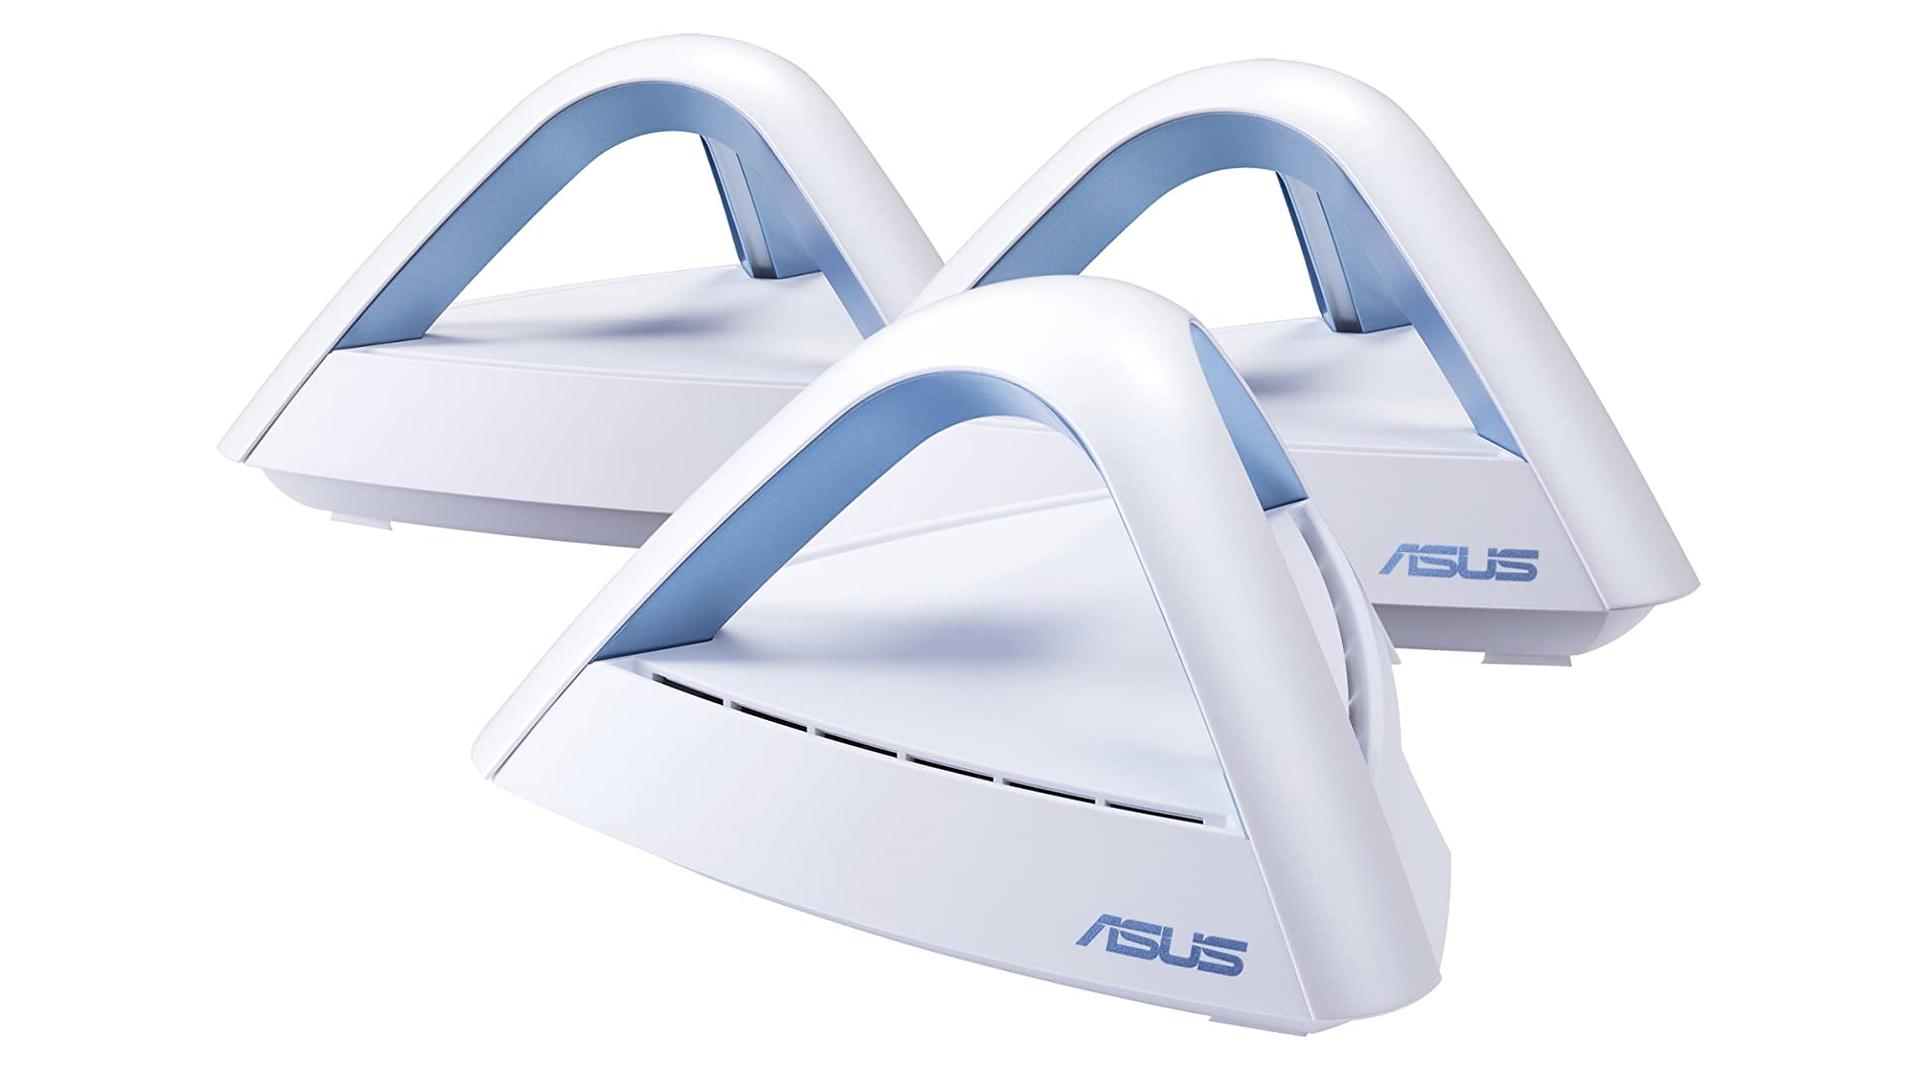 Asus Lyra Trio mesh routers